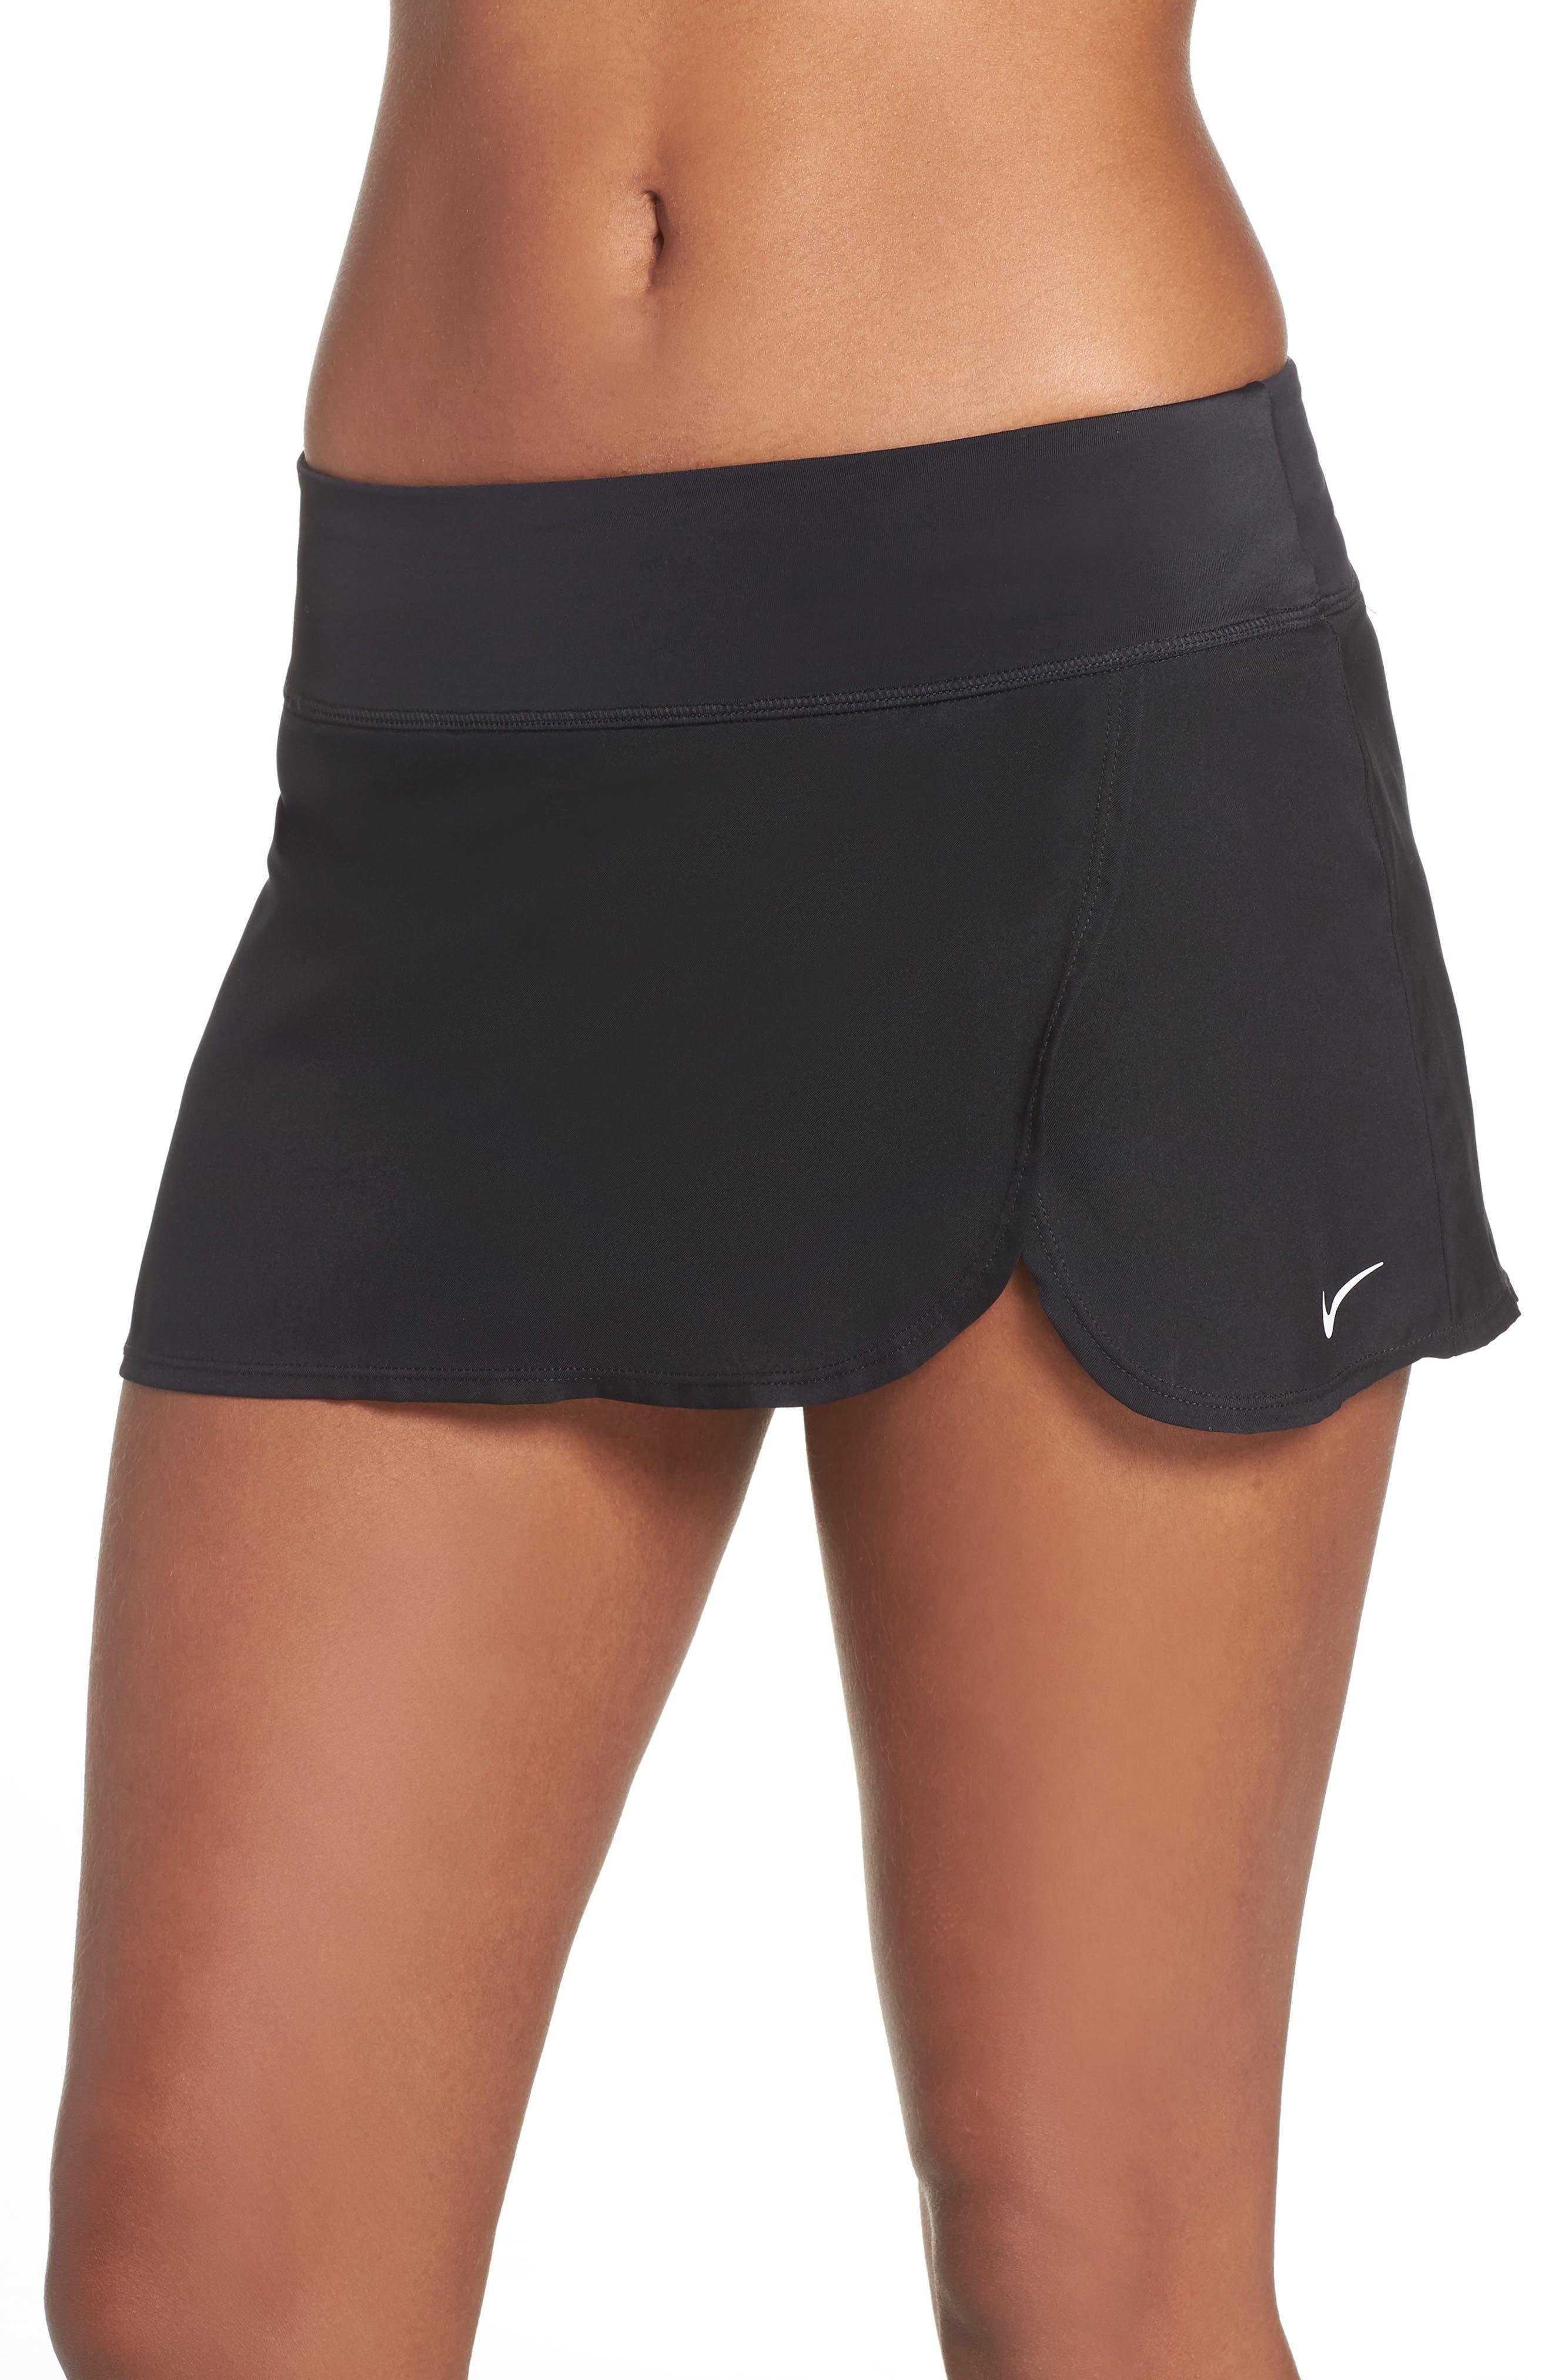 Swim Board Skirt,                         Main,                         color, BLACK